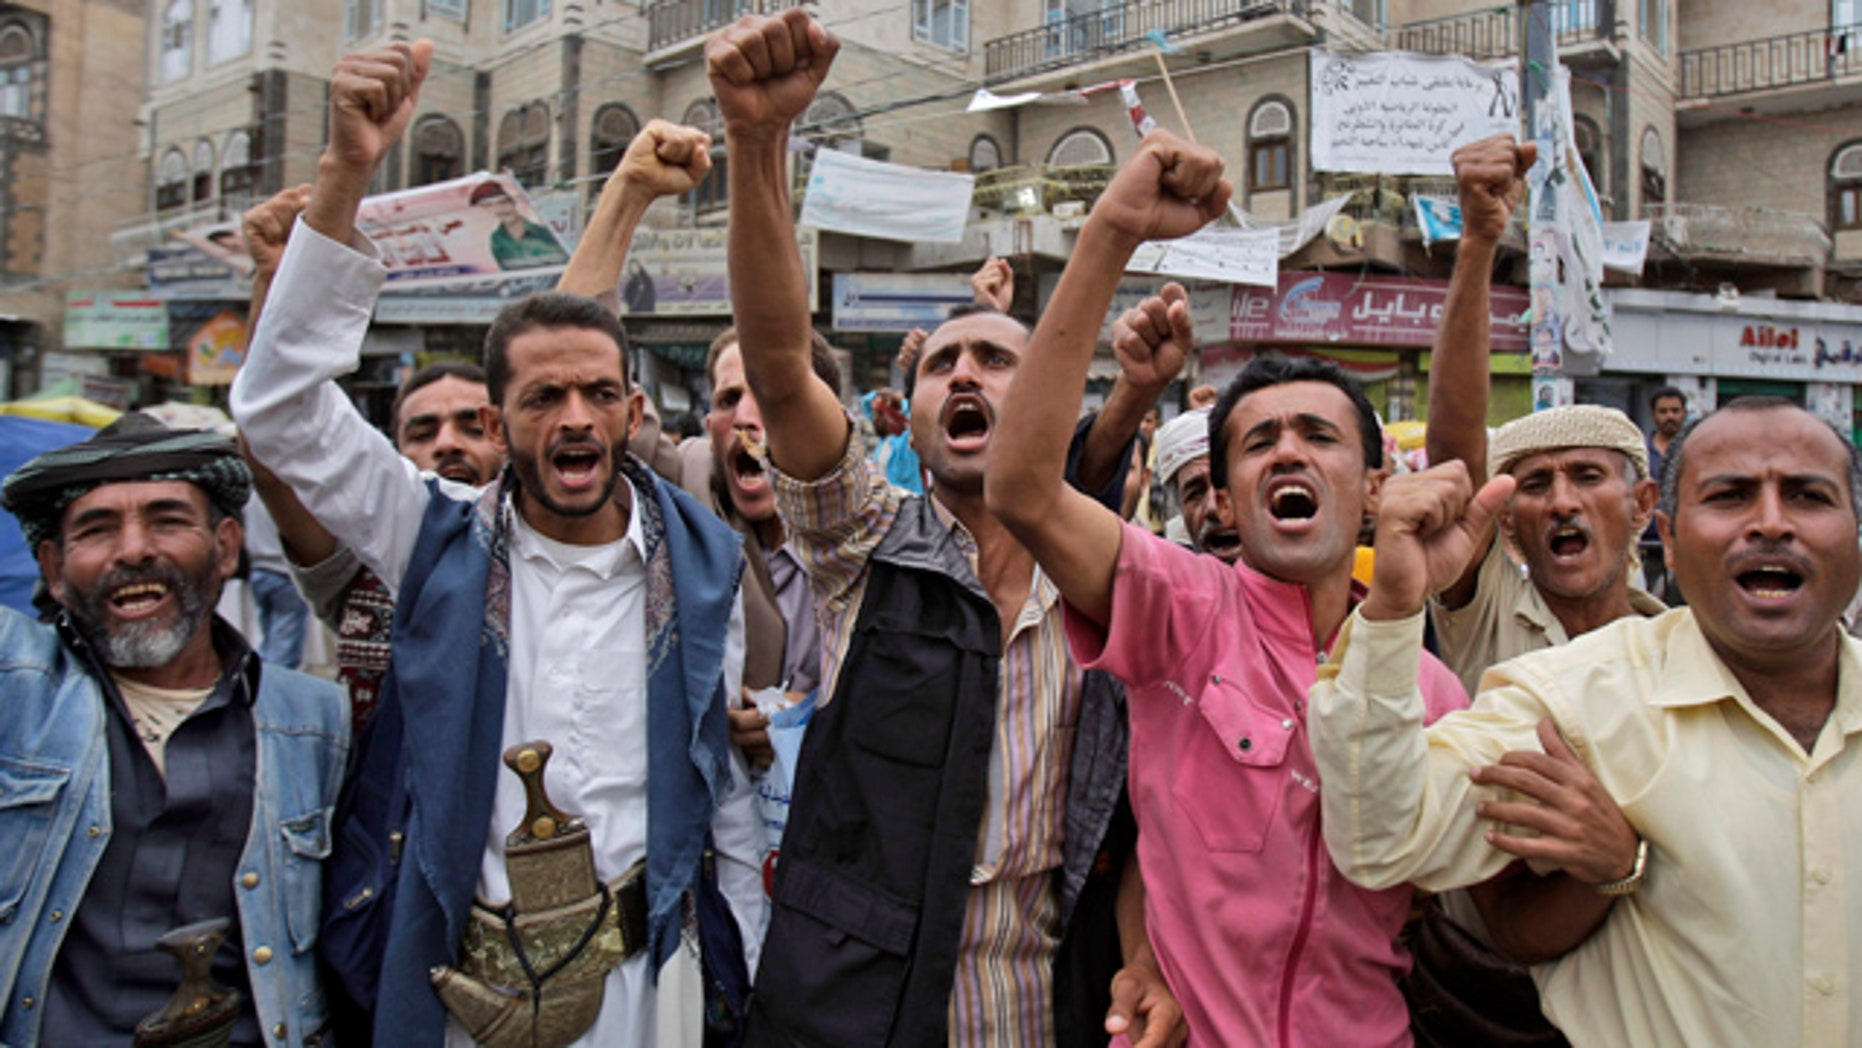 July 5: Anti-government protestors shout slogans during a demonstration demanding the resignation of Yemeni President Ali Abdullah Saleh in Sanaa, Yemen.